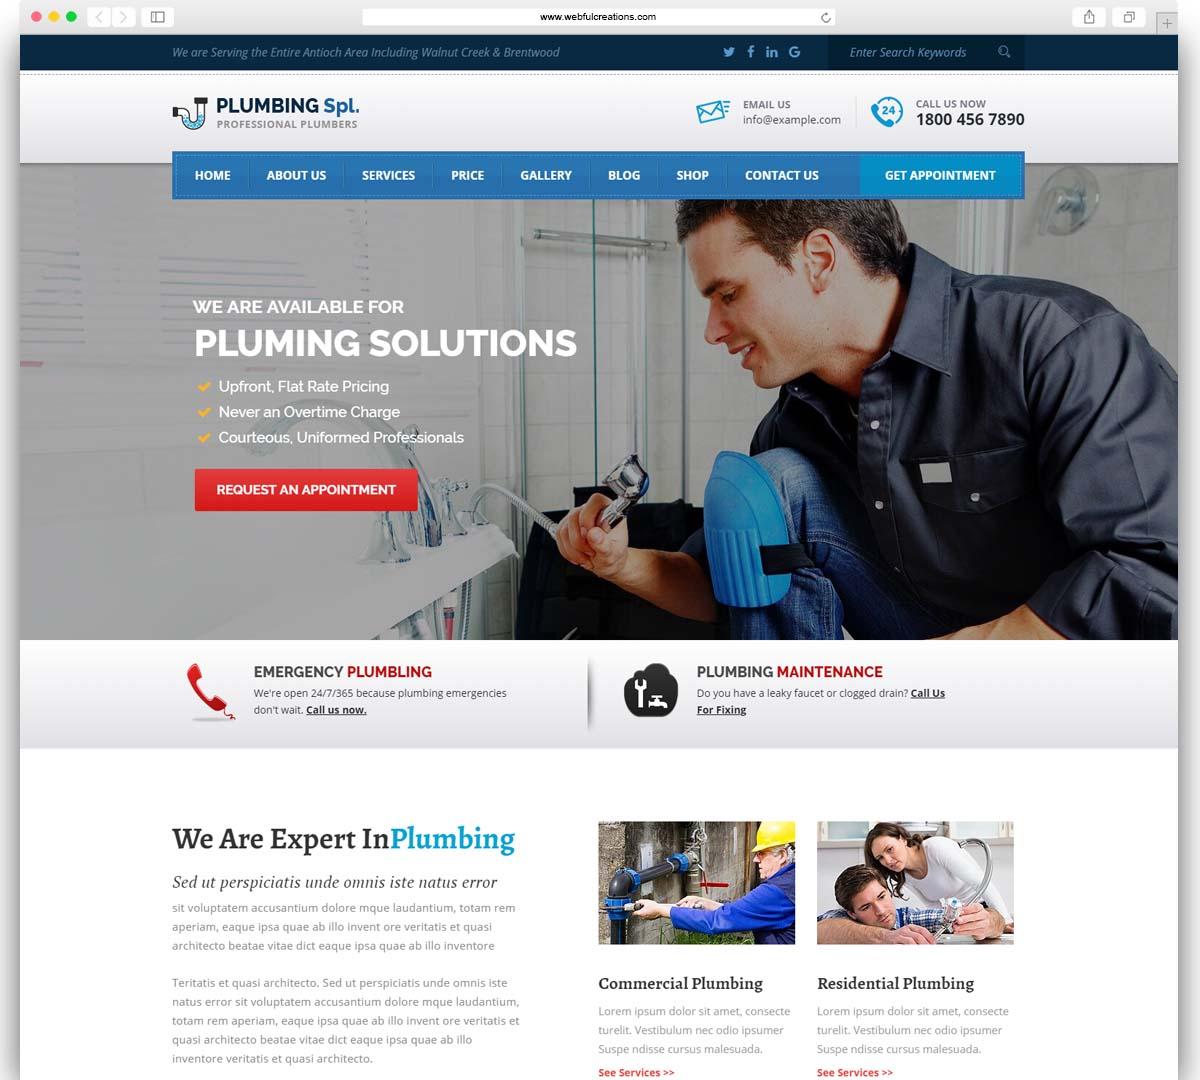 Plumbing Spl - Plumber WordPress Theme